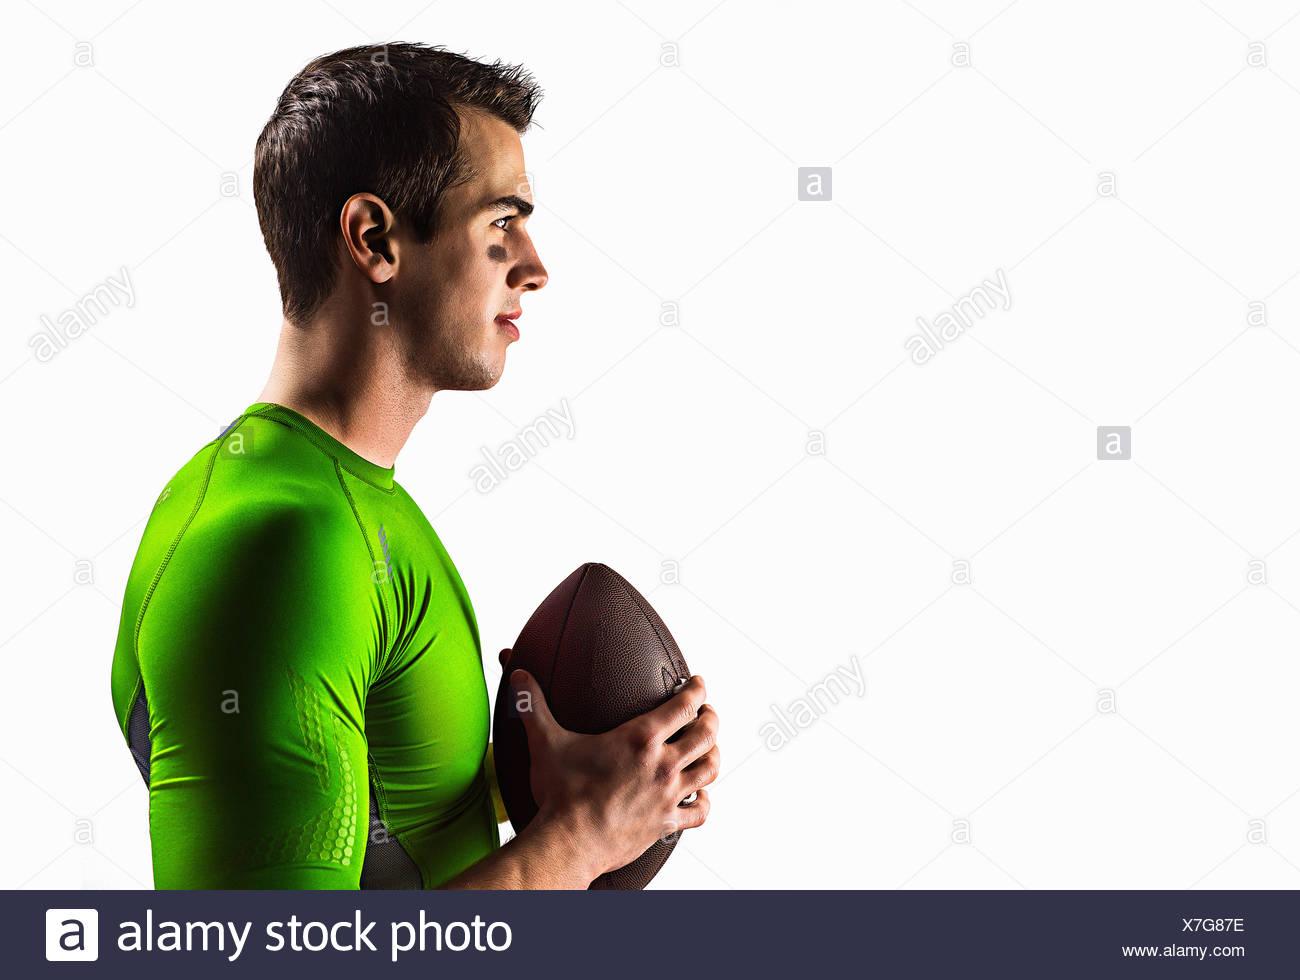 Athletic man holding football - Stock Image